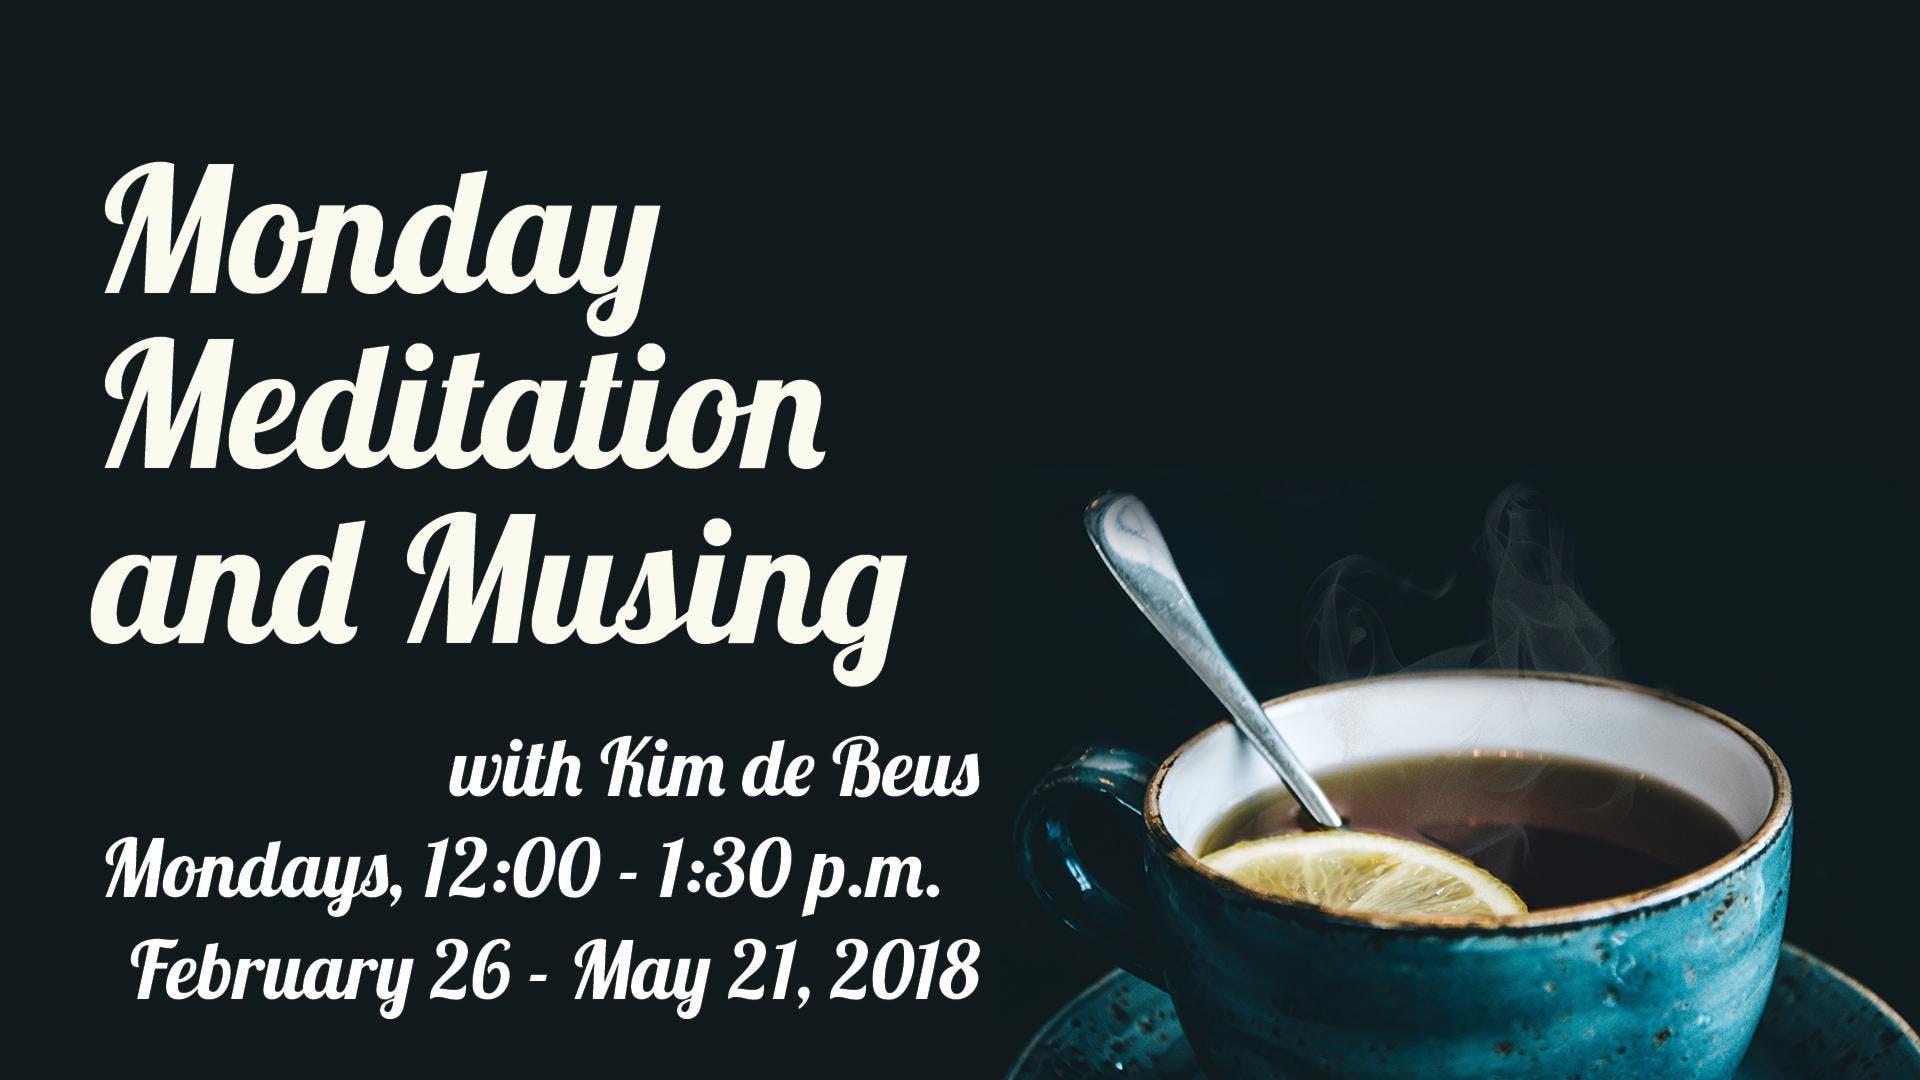 Meditation - Mondays with Kim de Beus